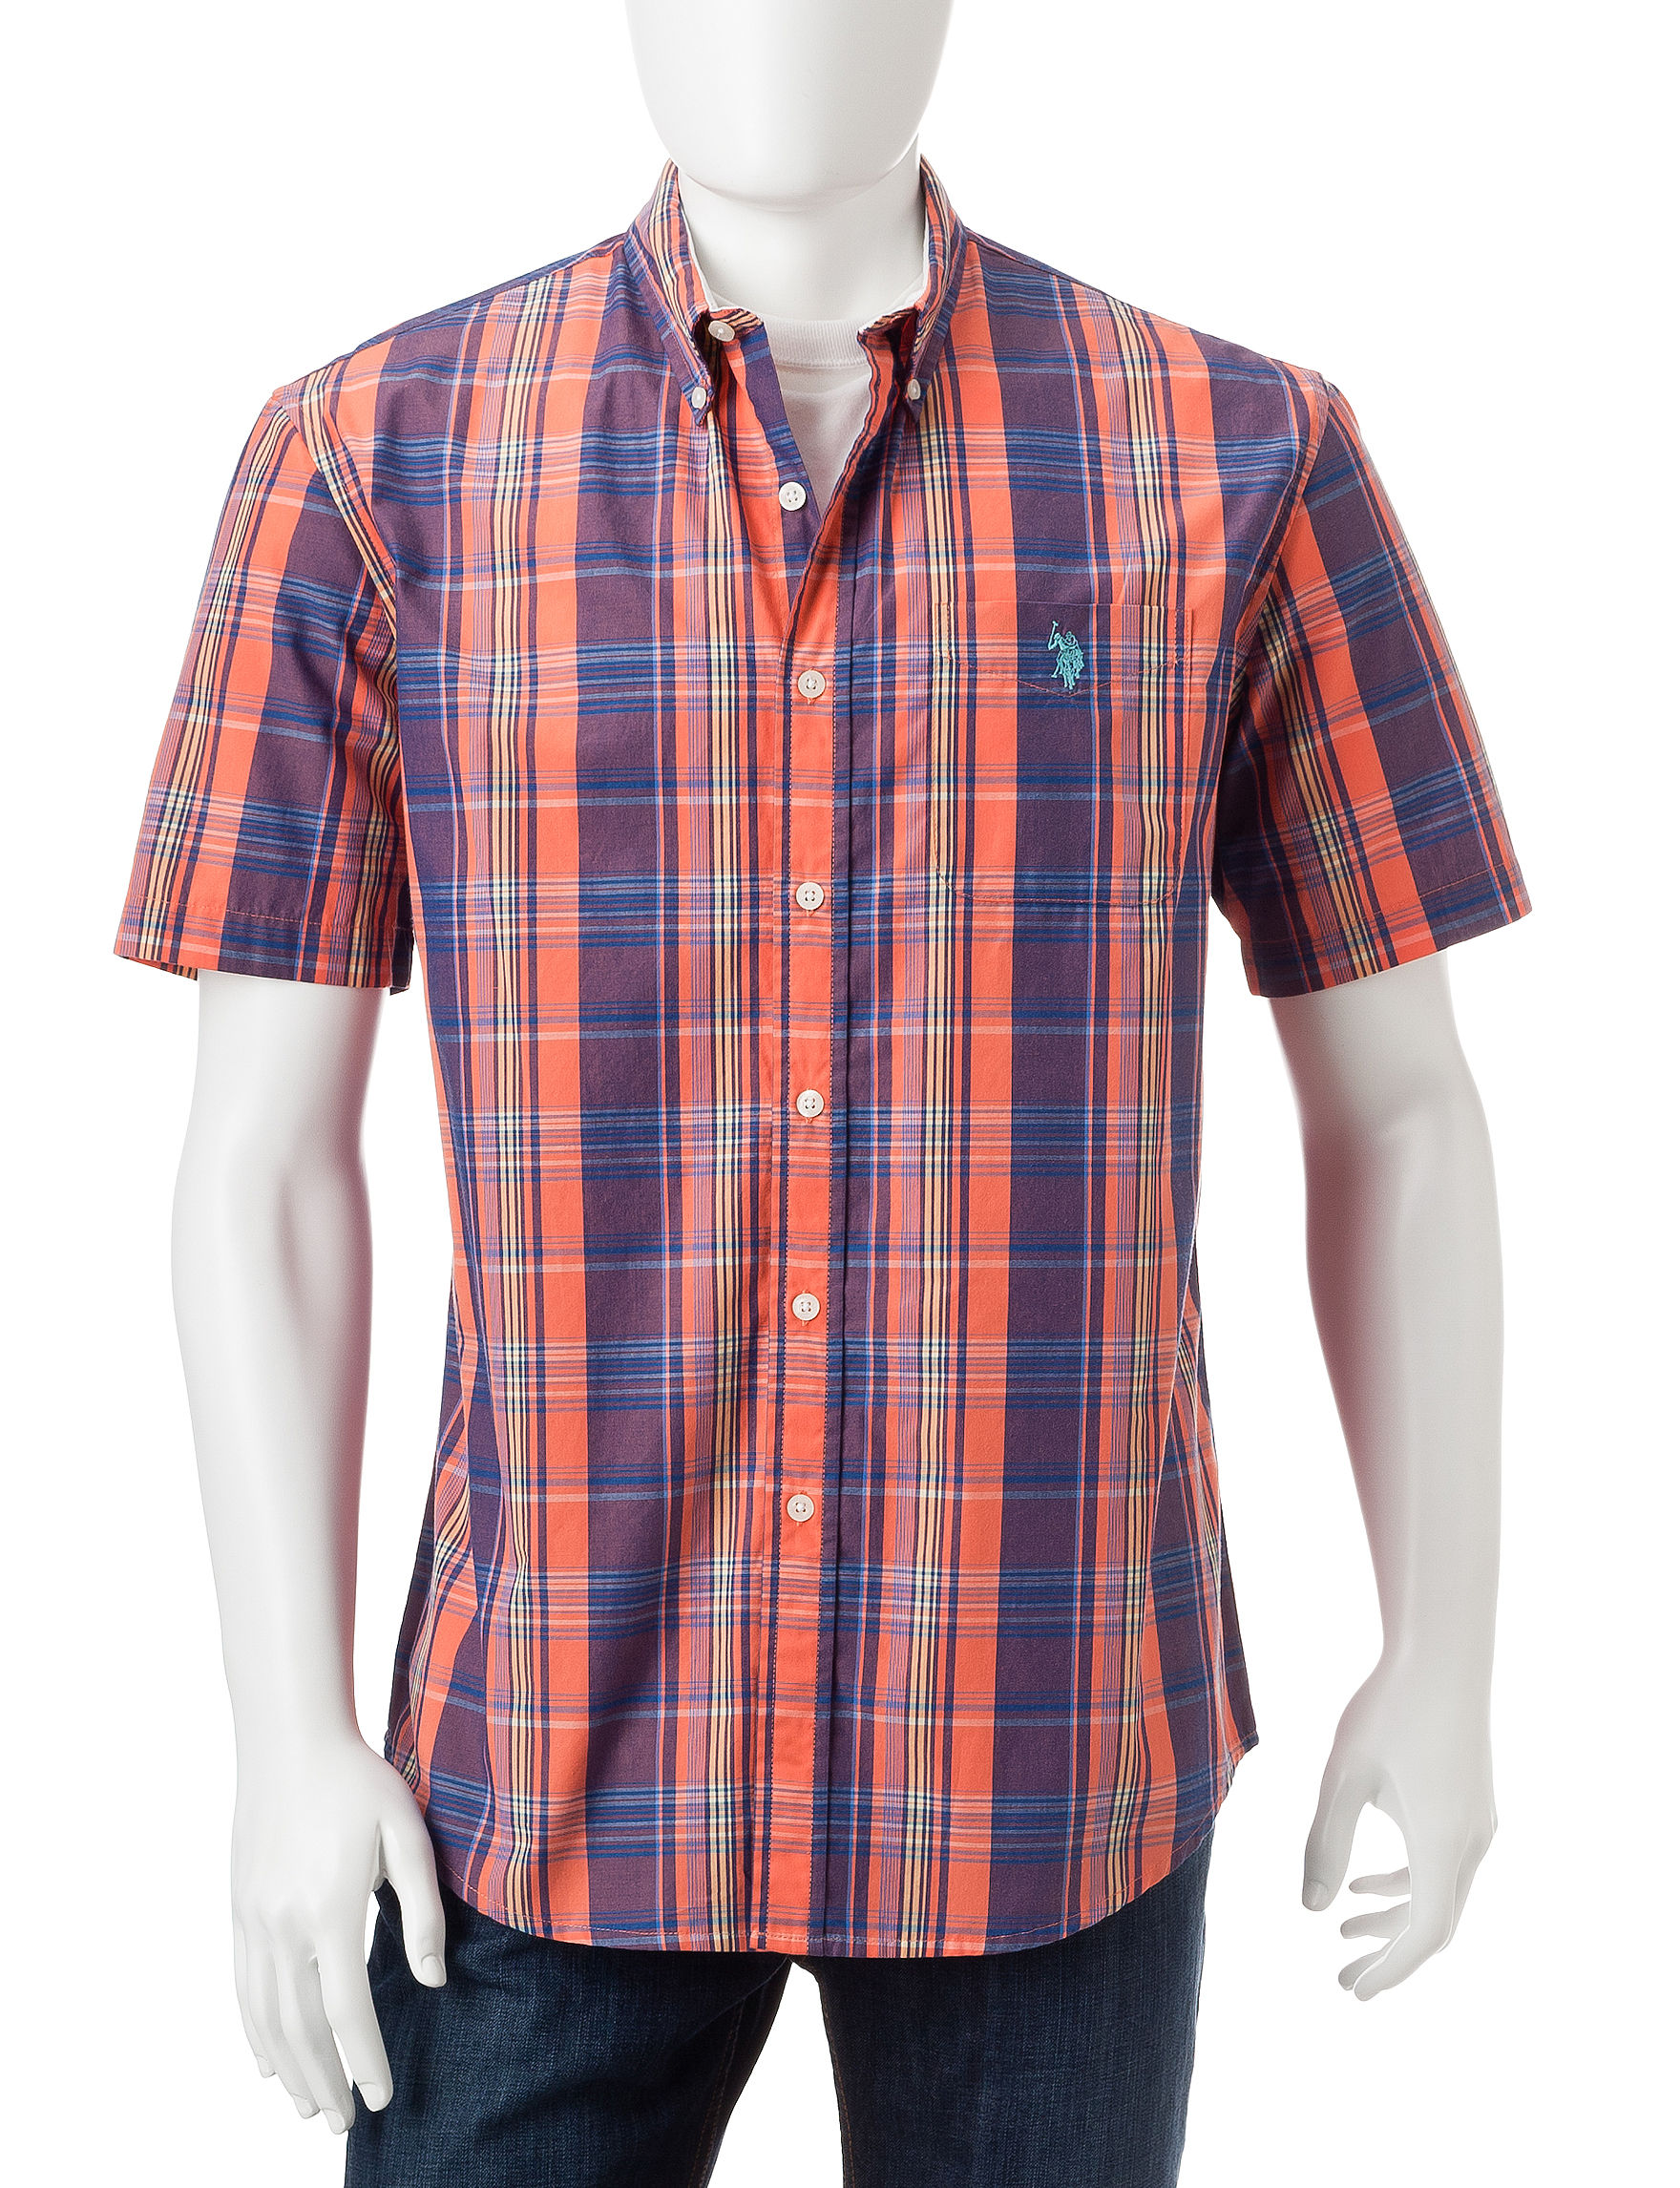 U.S. Polo Assn. Orange Casual Button Down Shirts